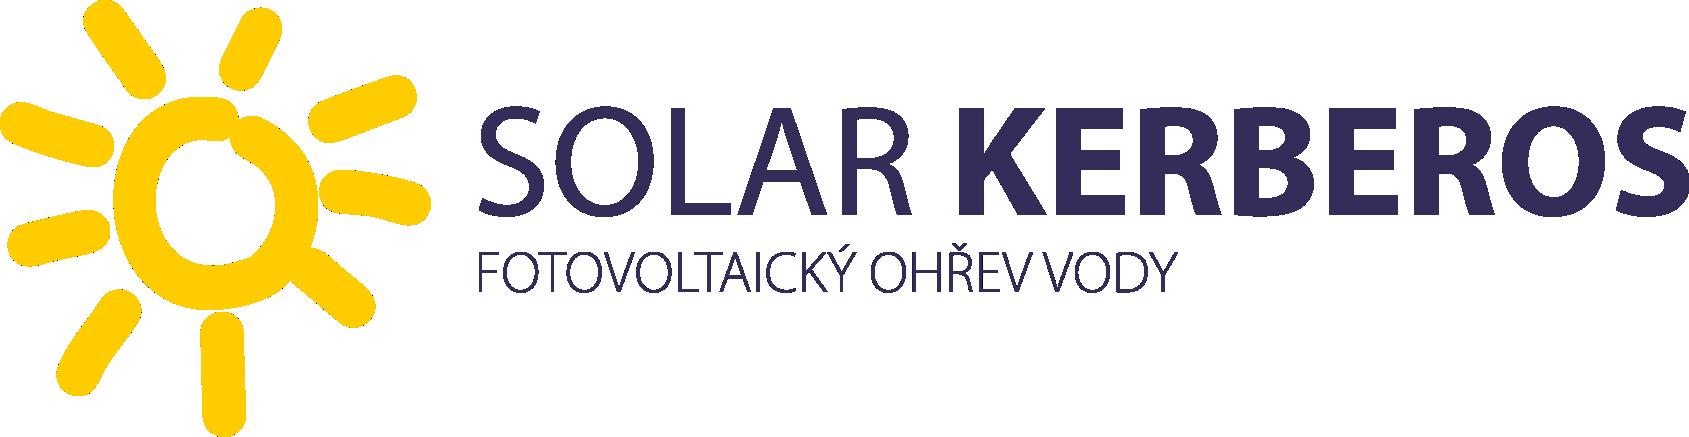 SOLAR KERBEROS - solární ohřev vody